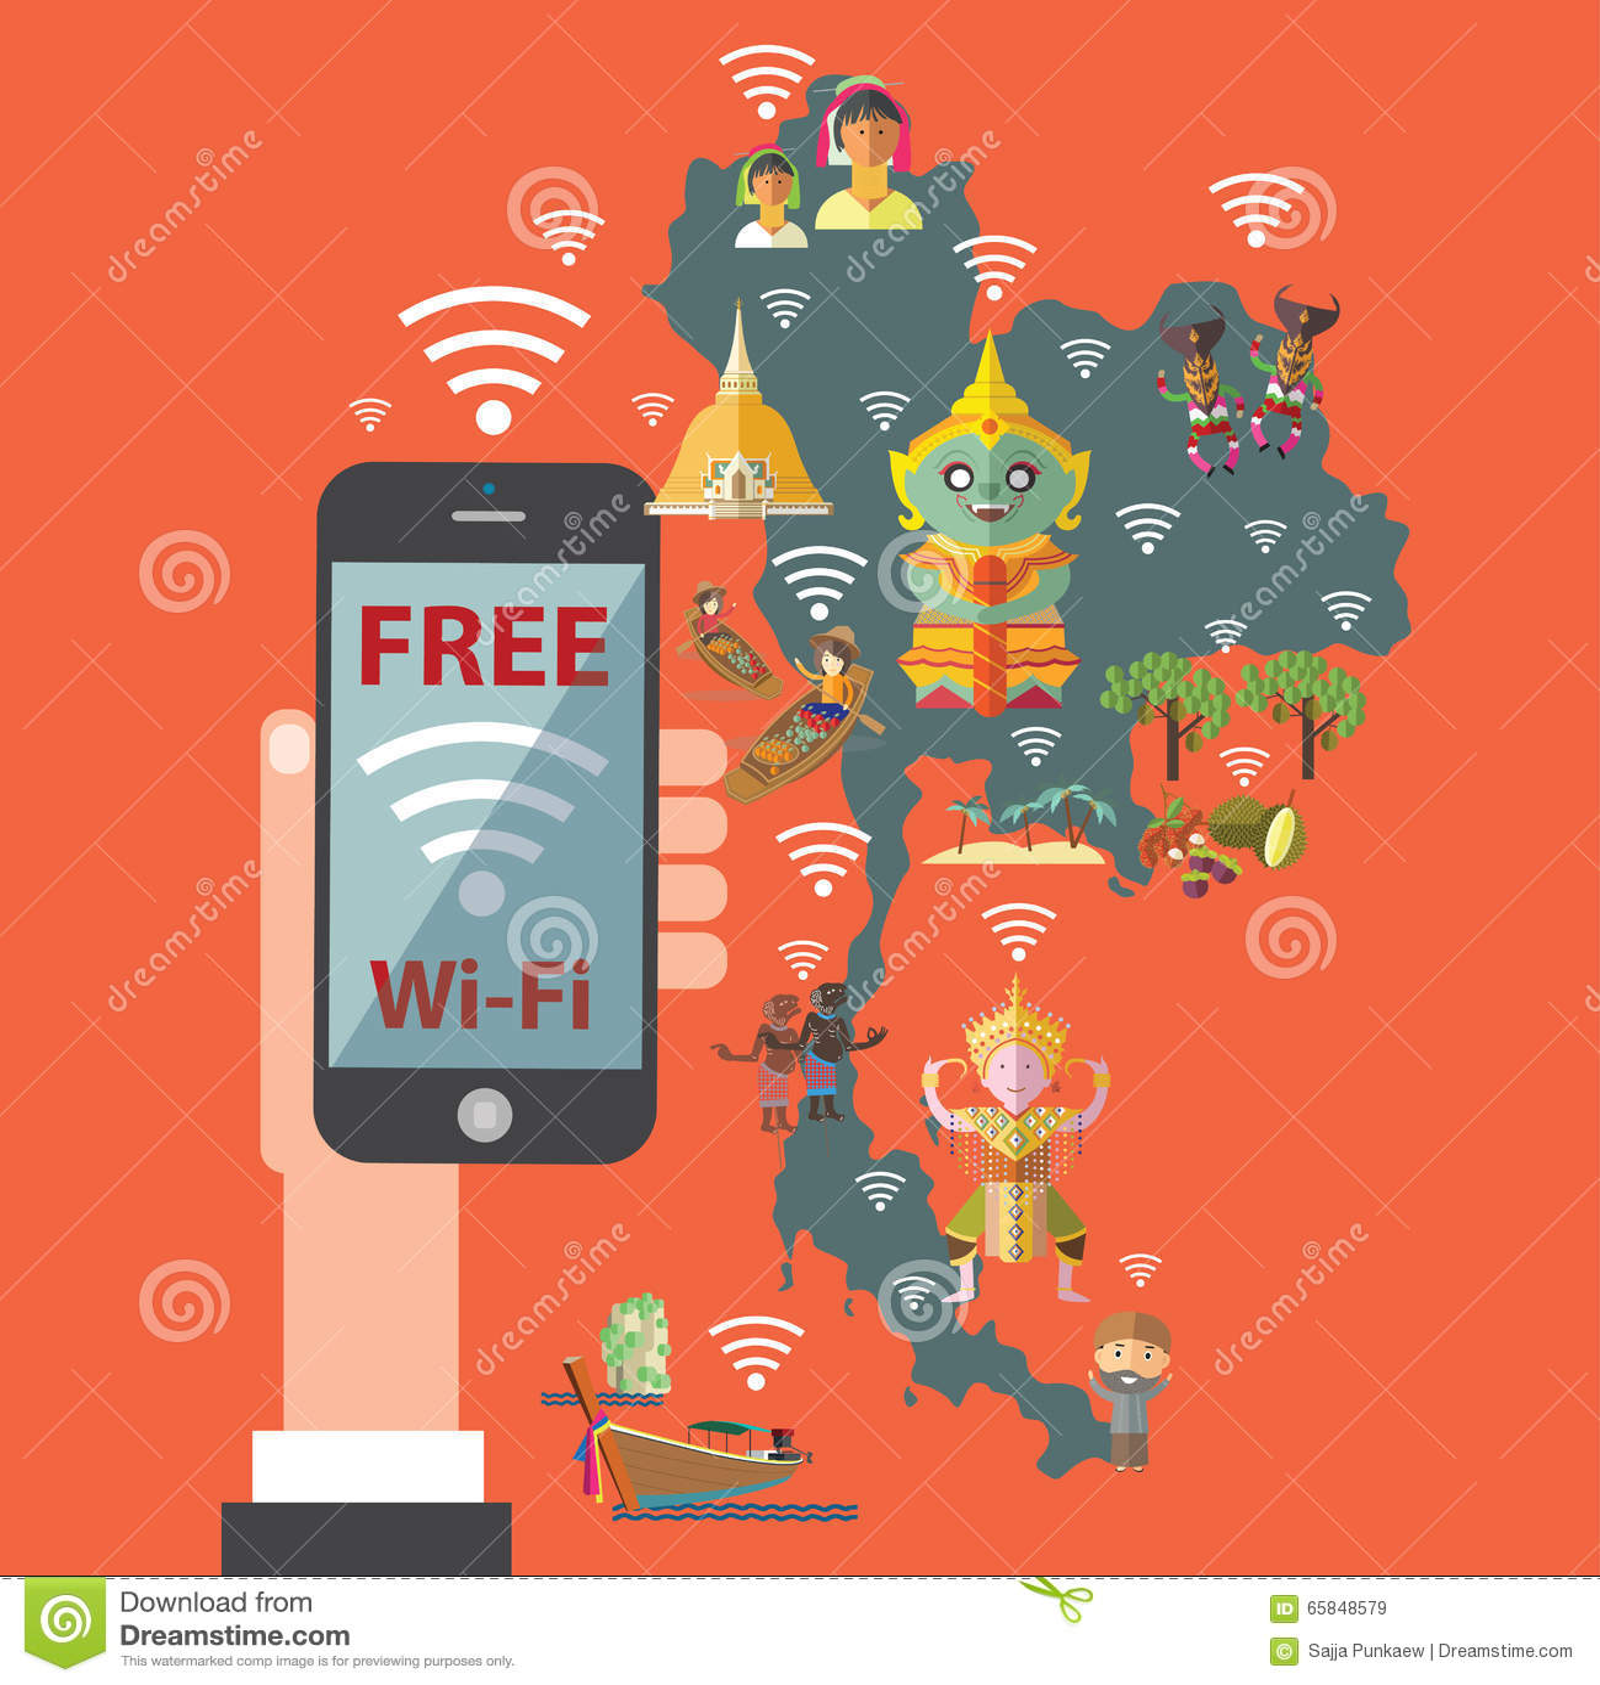 Carte Wifi Thailande.Wifi Gratuit Avec La Carte De La Thailande Illustration De Vecteur